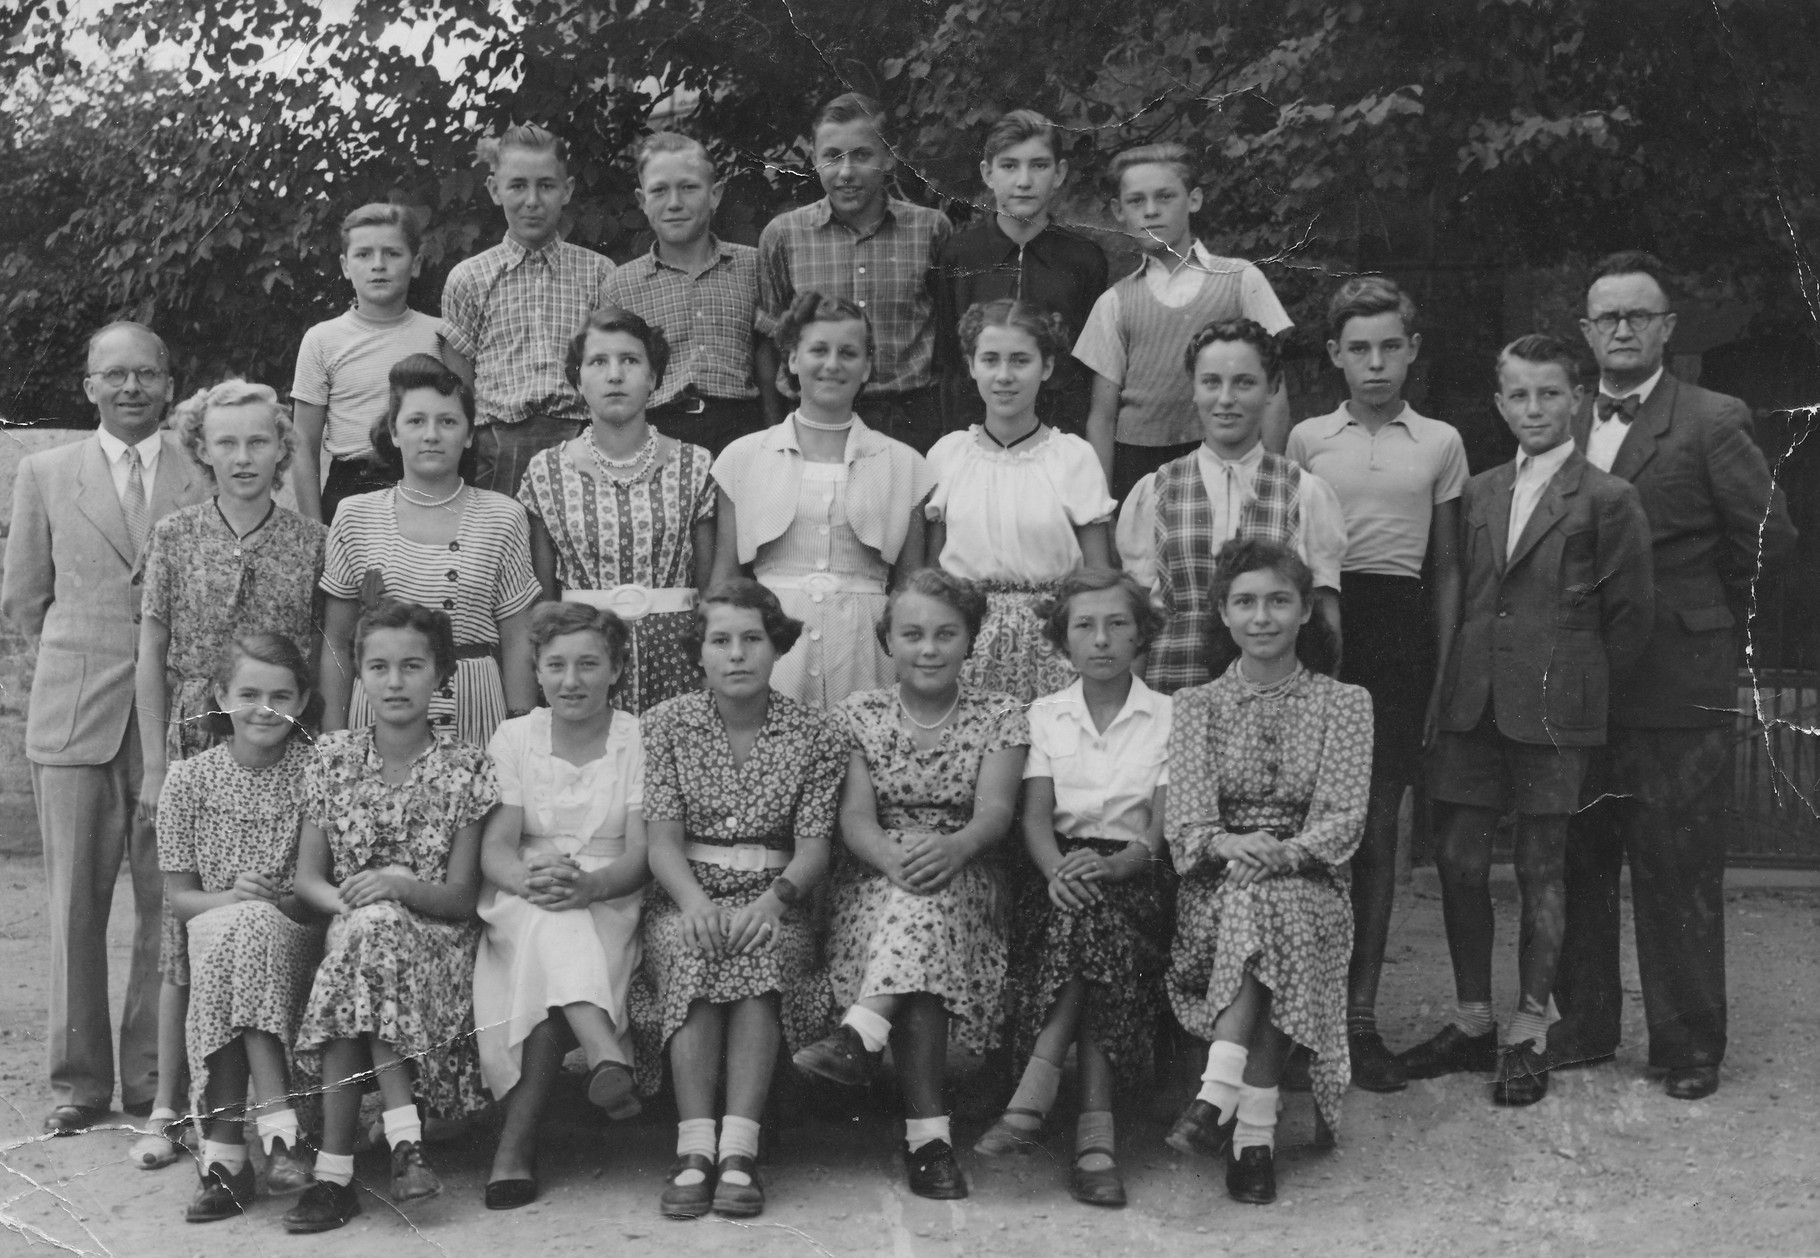 Jahrgang 1938,Bild:Weimar,Else geb. Bruder